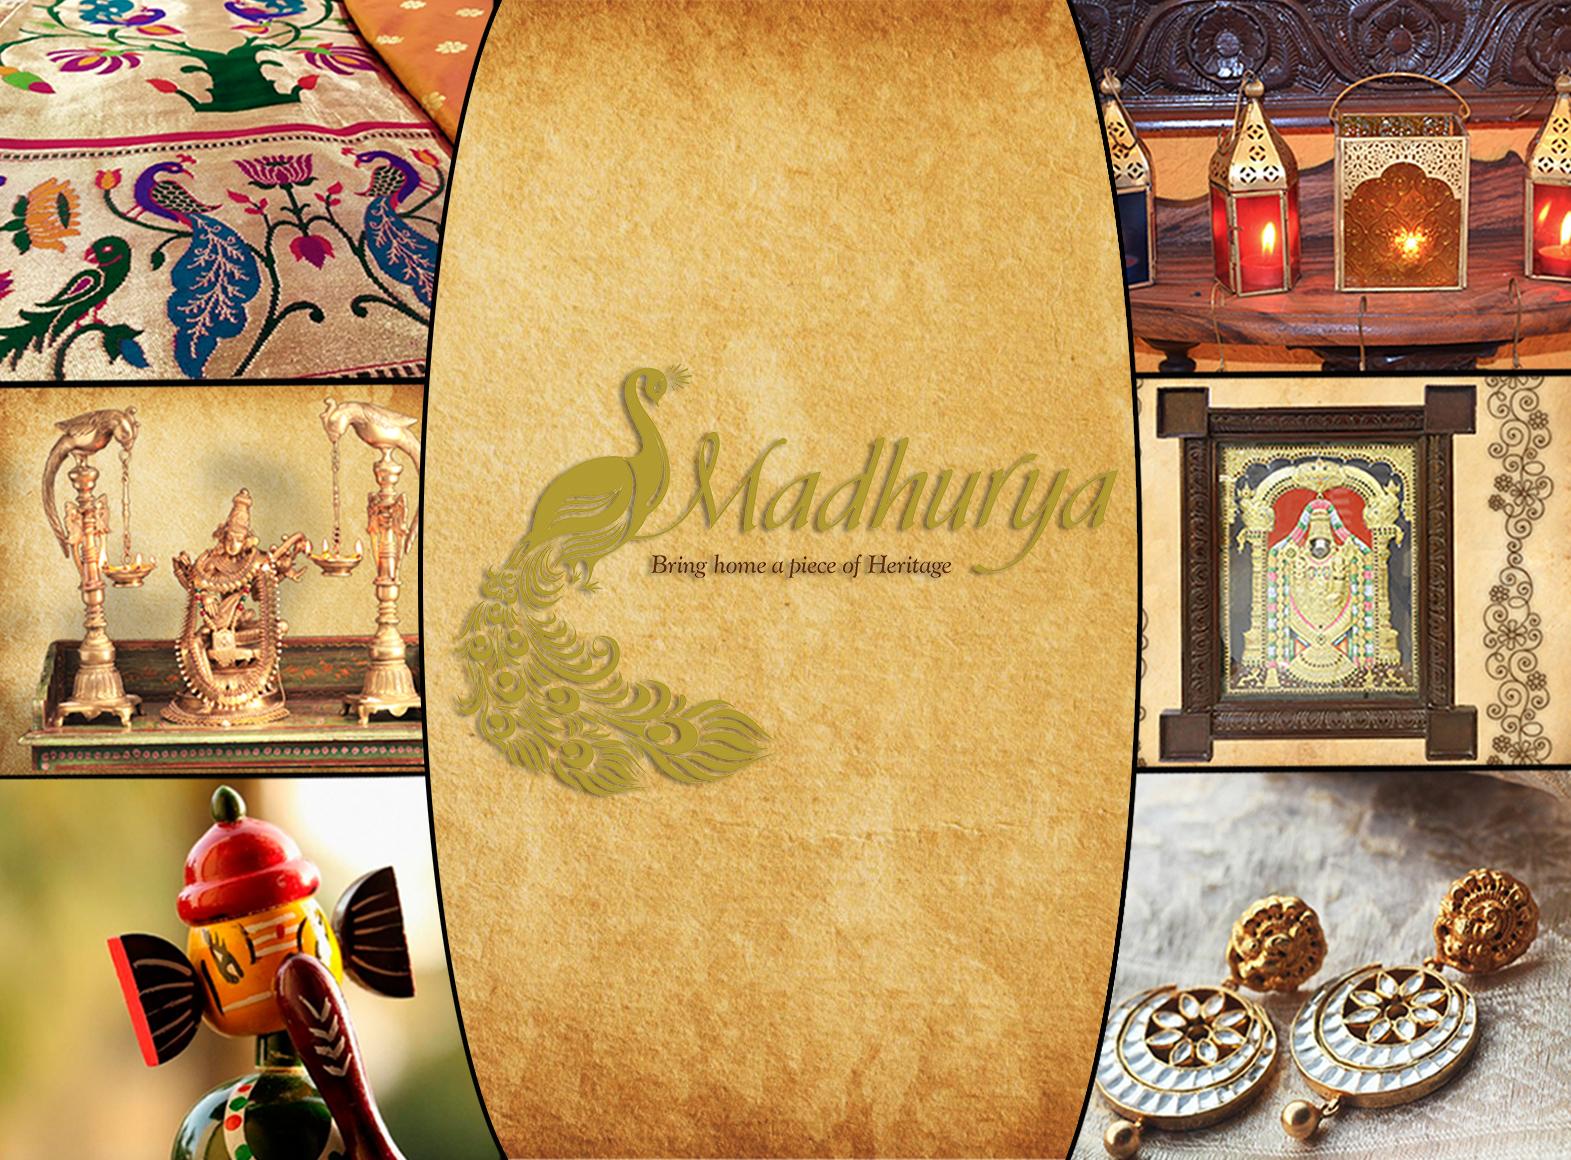 About Us - Madhurya